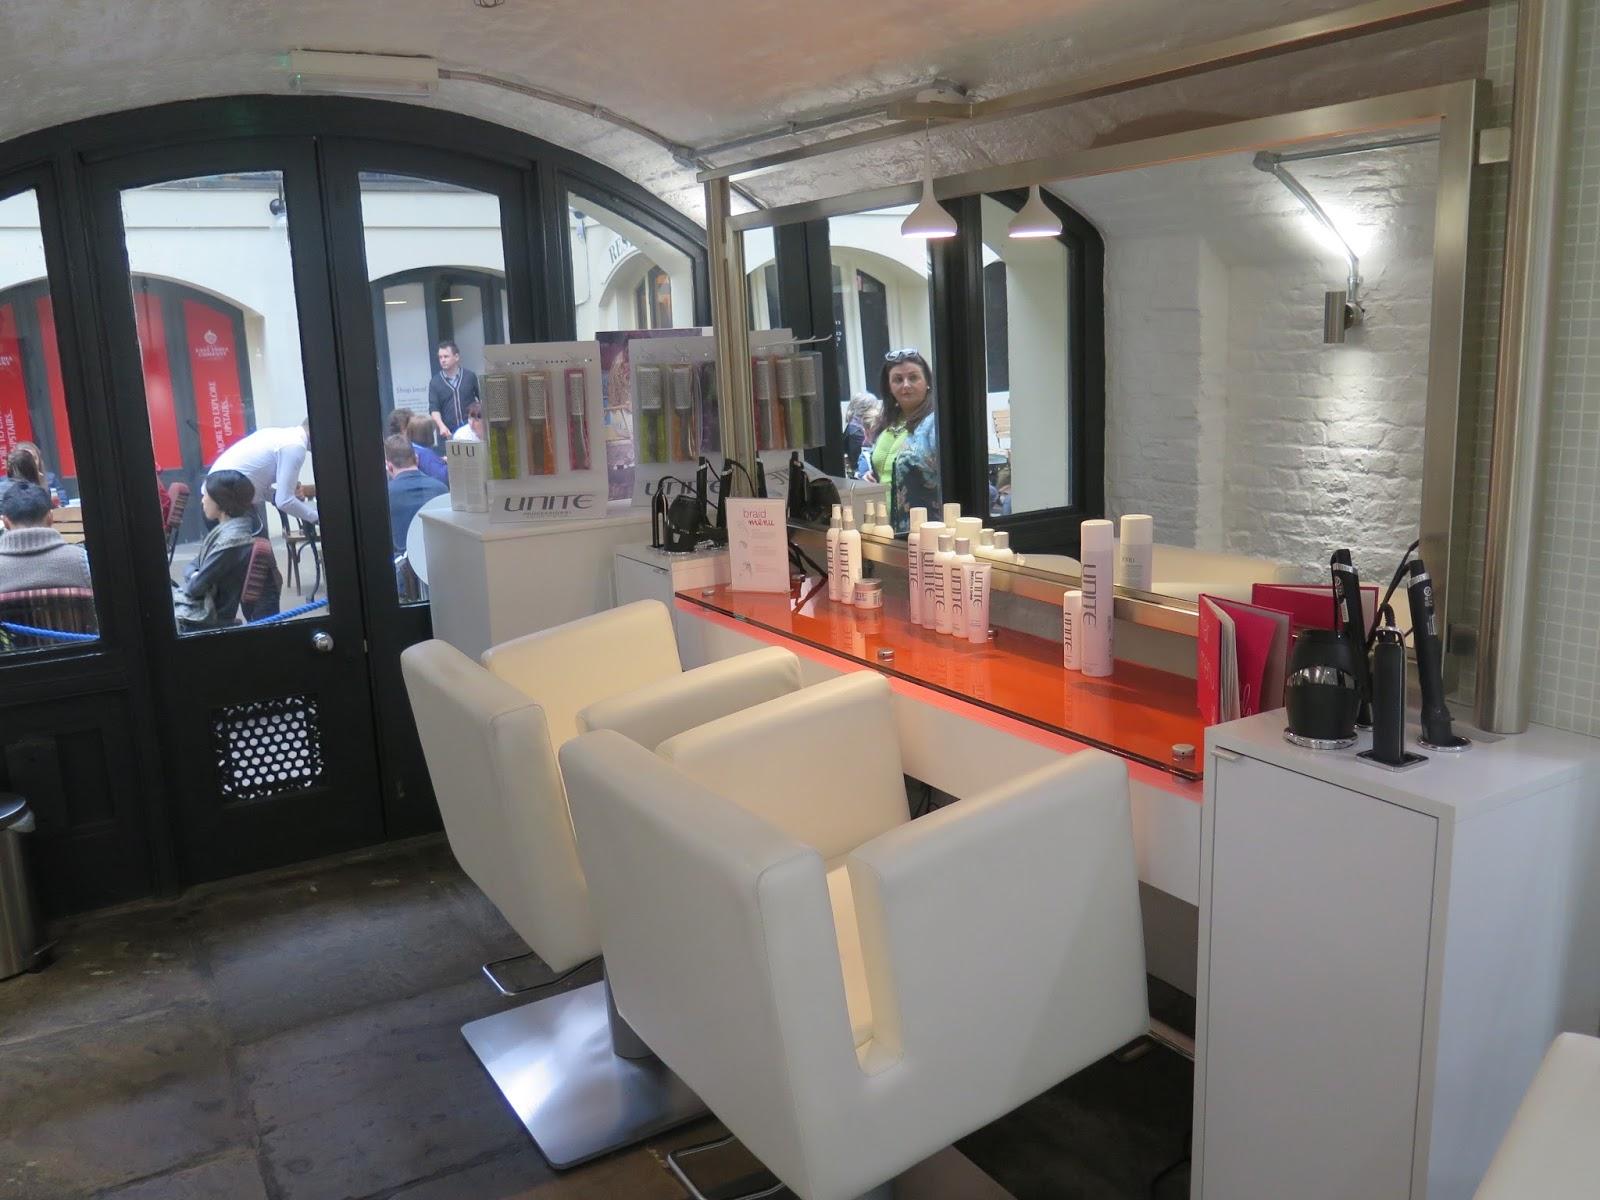 Blo blow dry bar cocoa chelsea for Blo hair salon